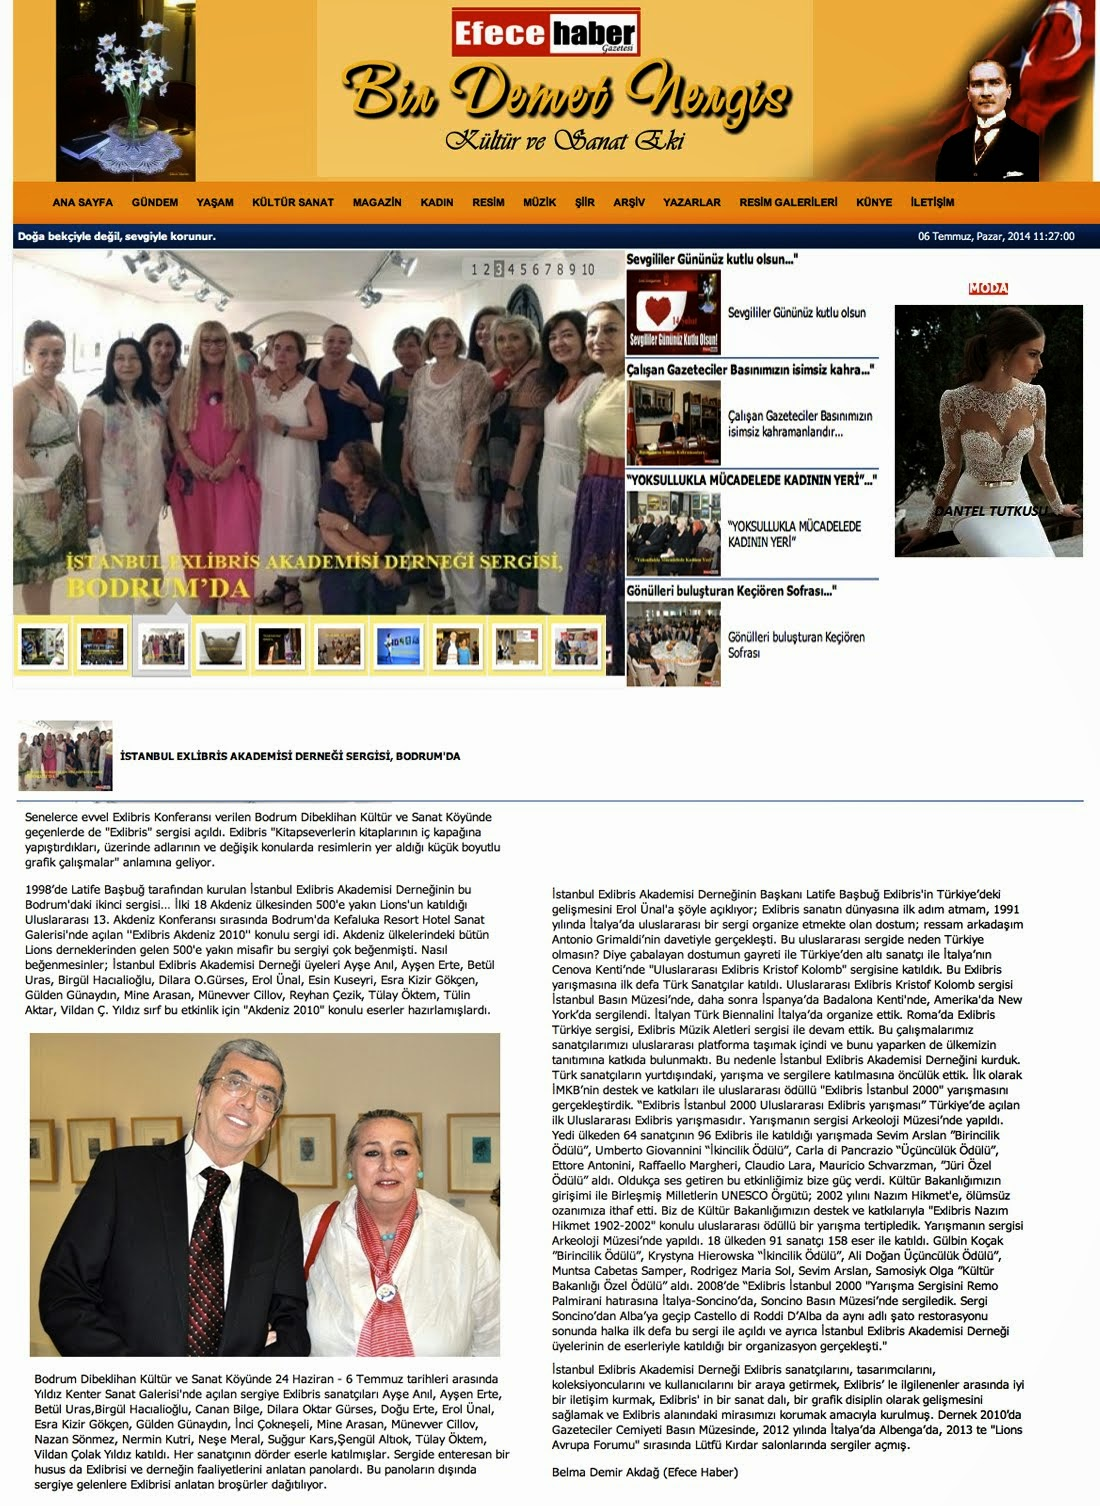 EFECE HABER/BİR DEMET NERGİS